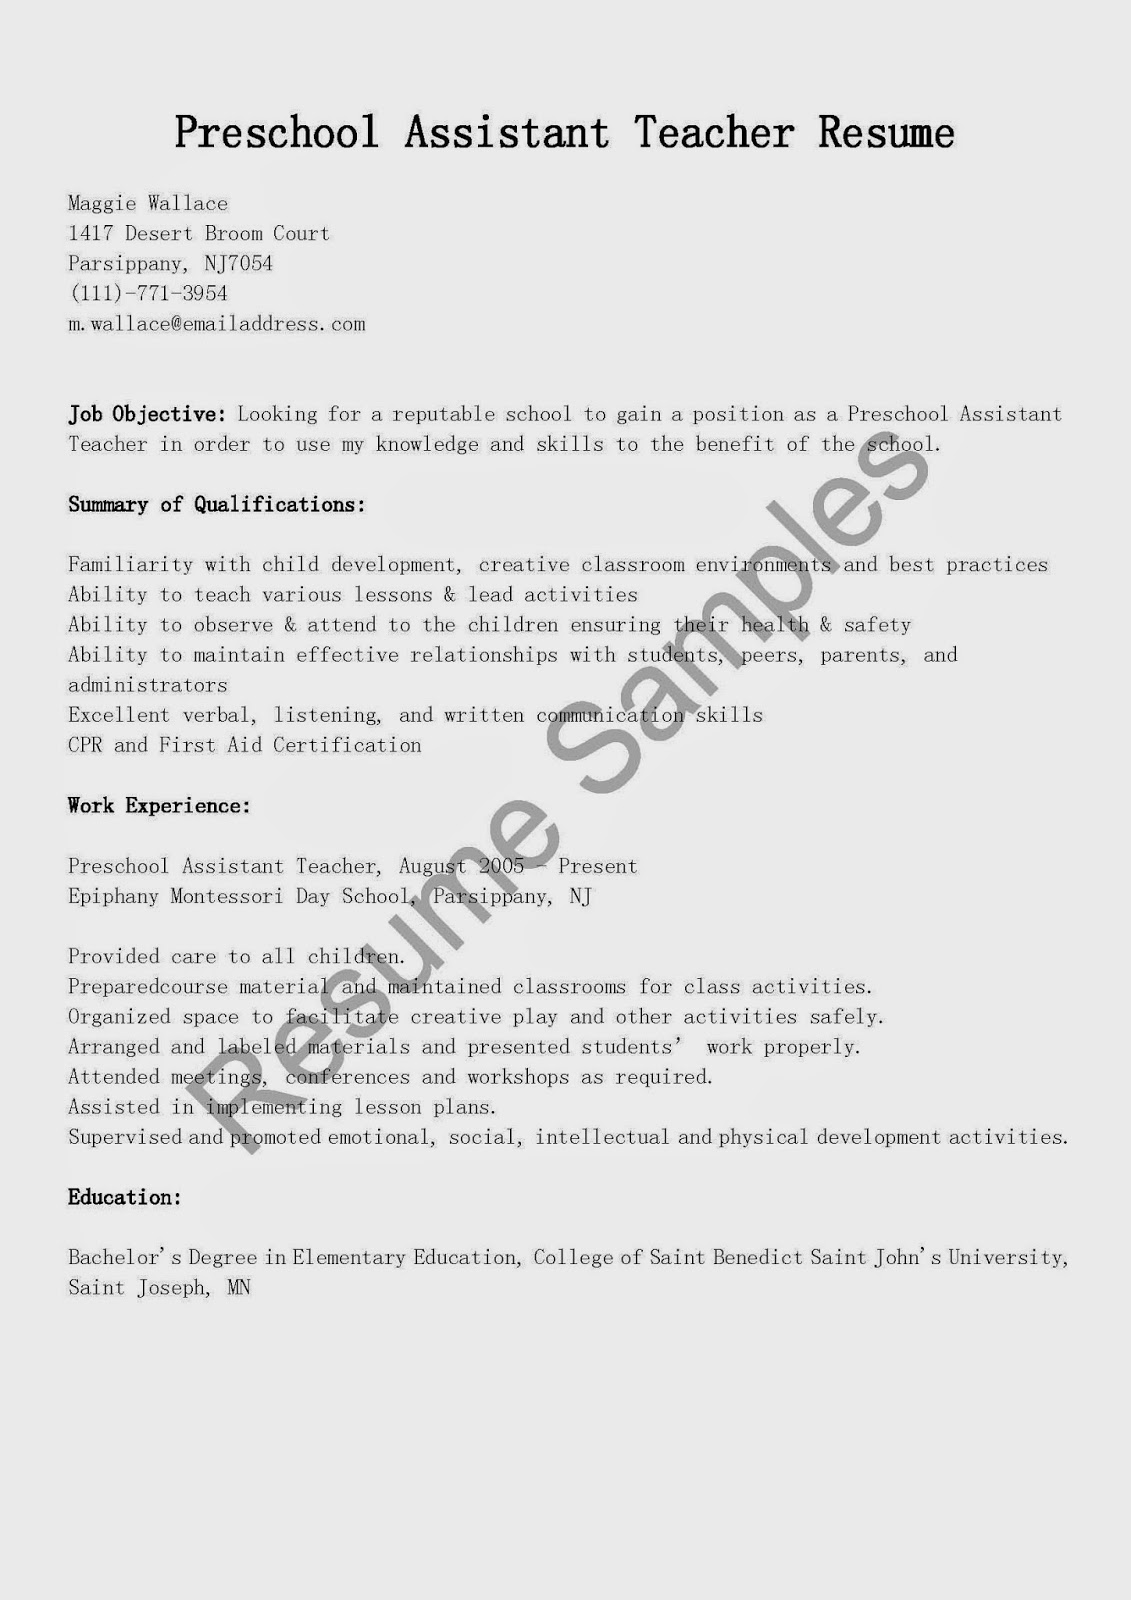 Resume Samples Preschool Assistant Teacher Sample